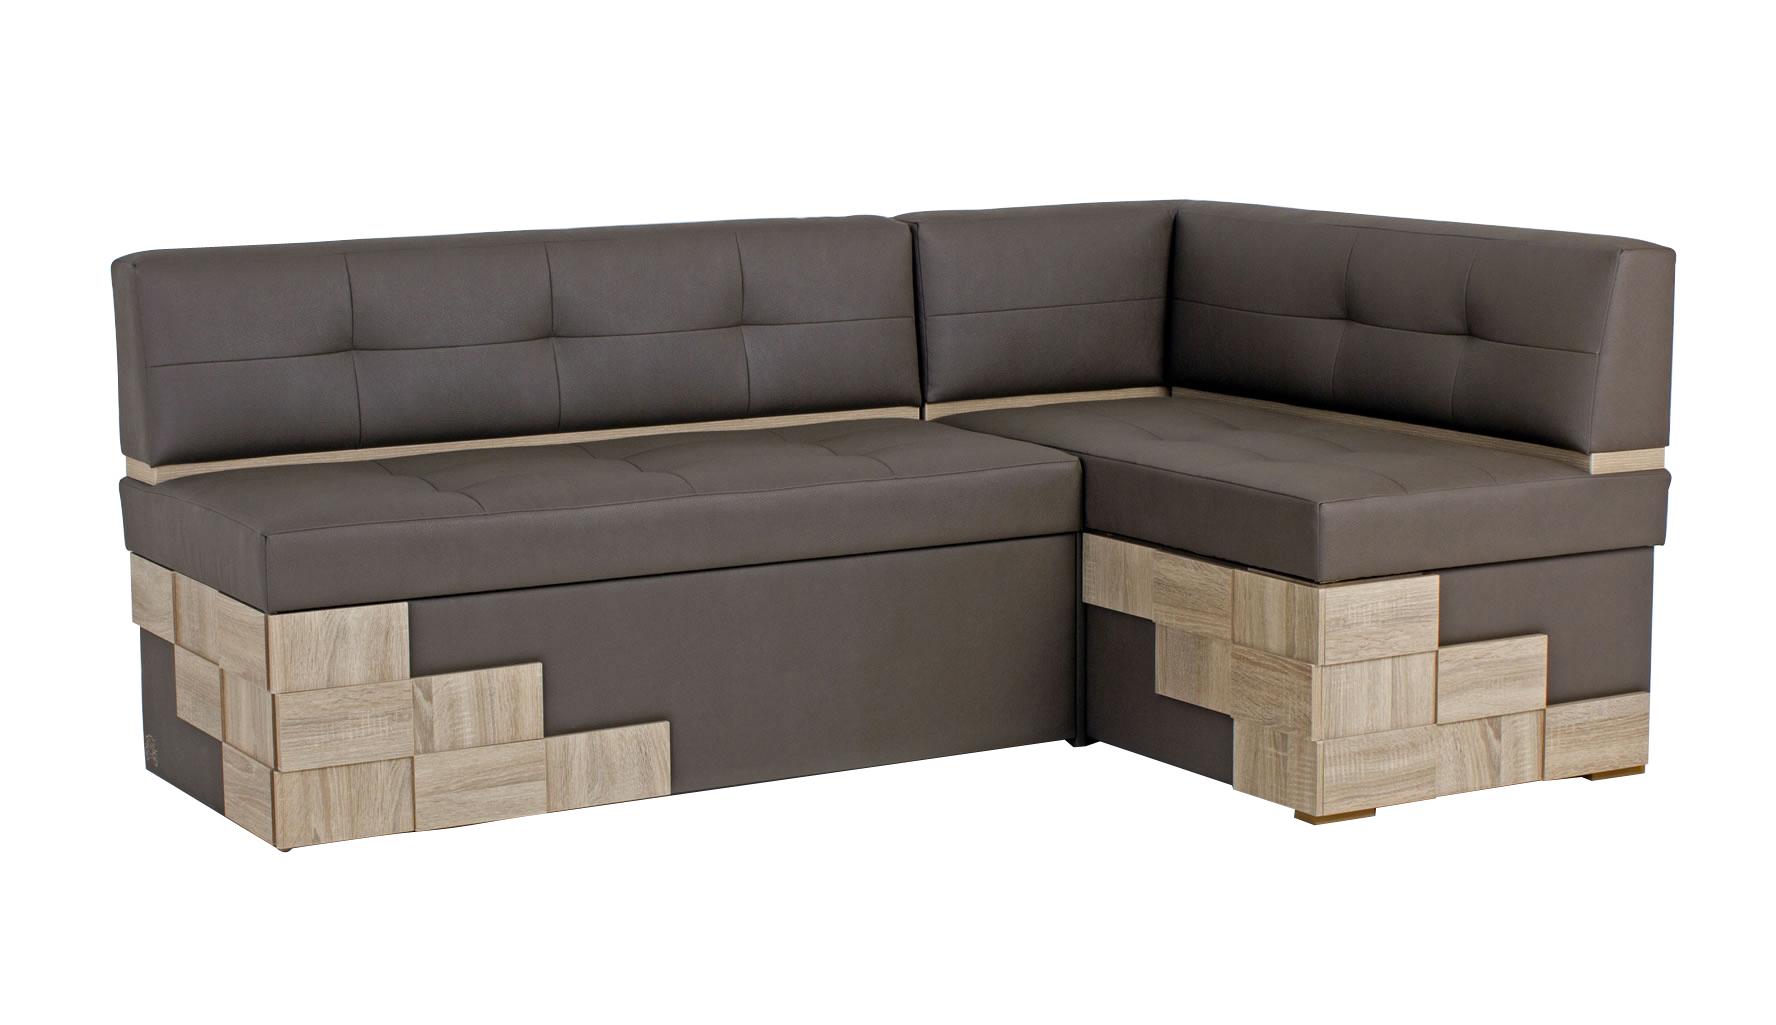 Кухонный угловой диван Редвиг кухонный угловой диван